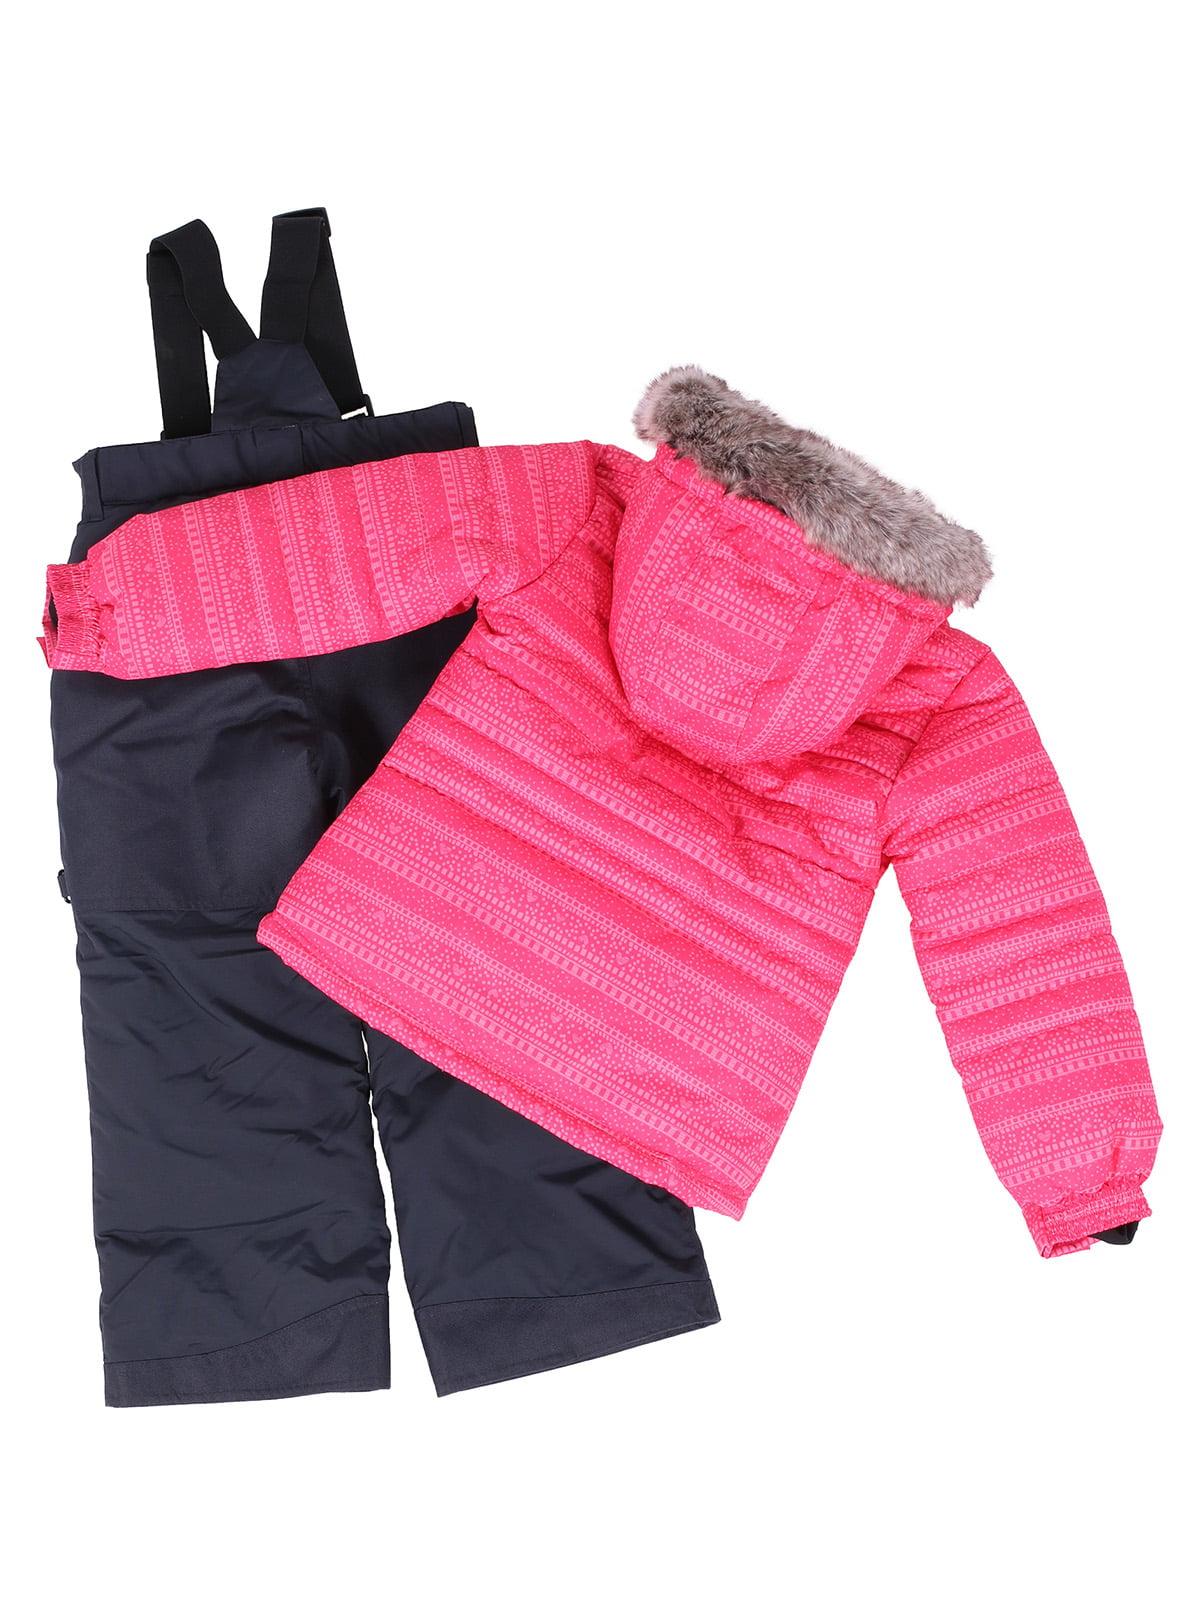 Термокомплект: куртка и полукомбинезон   4781805   фото 3